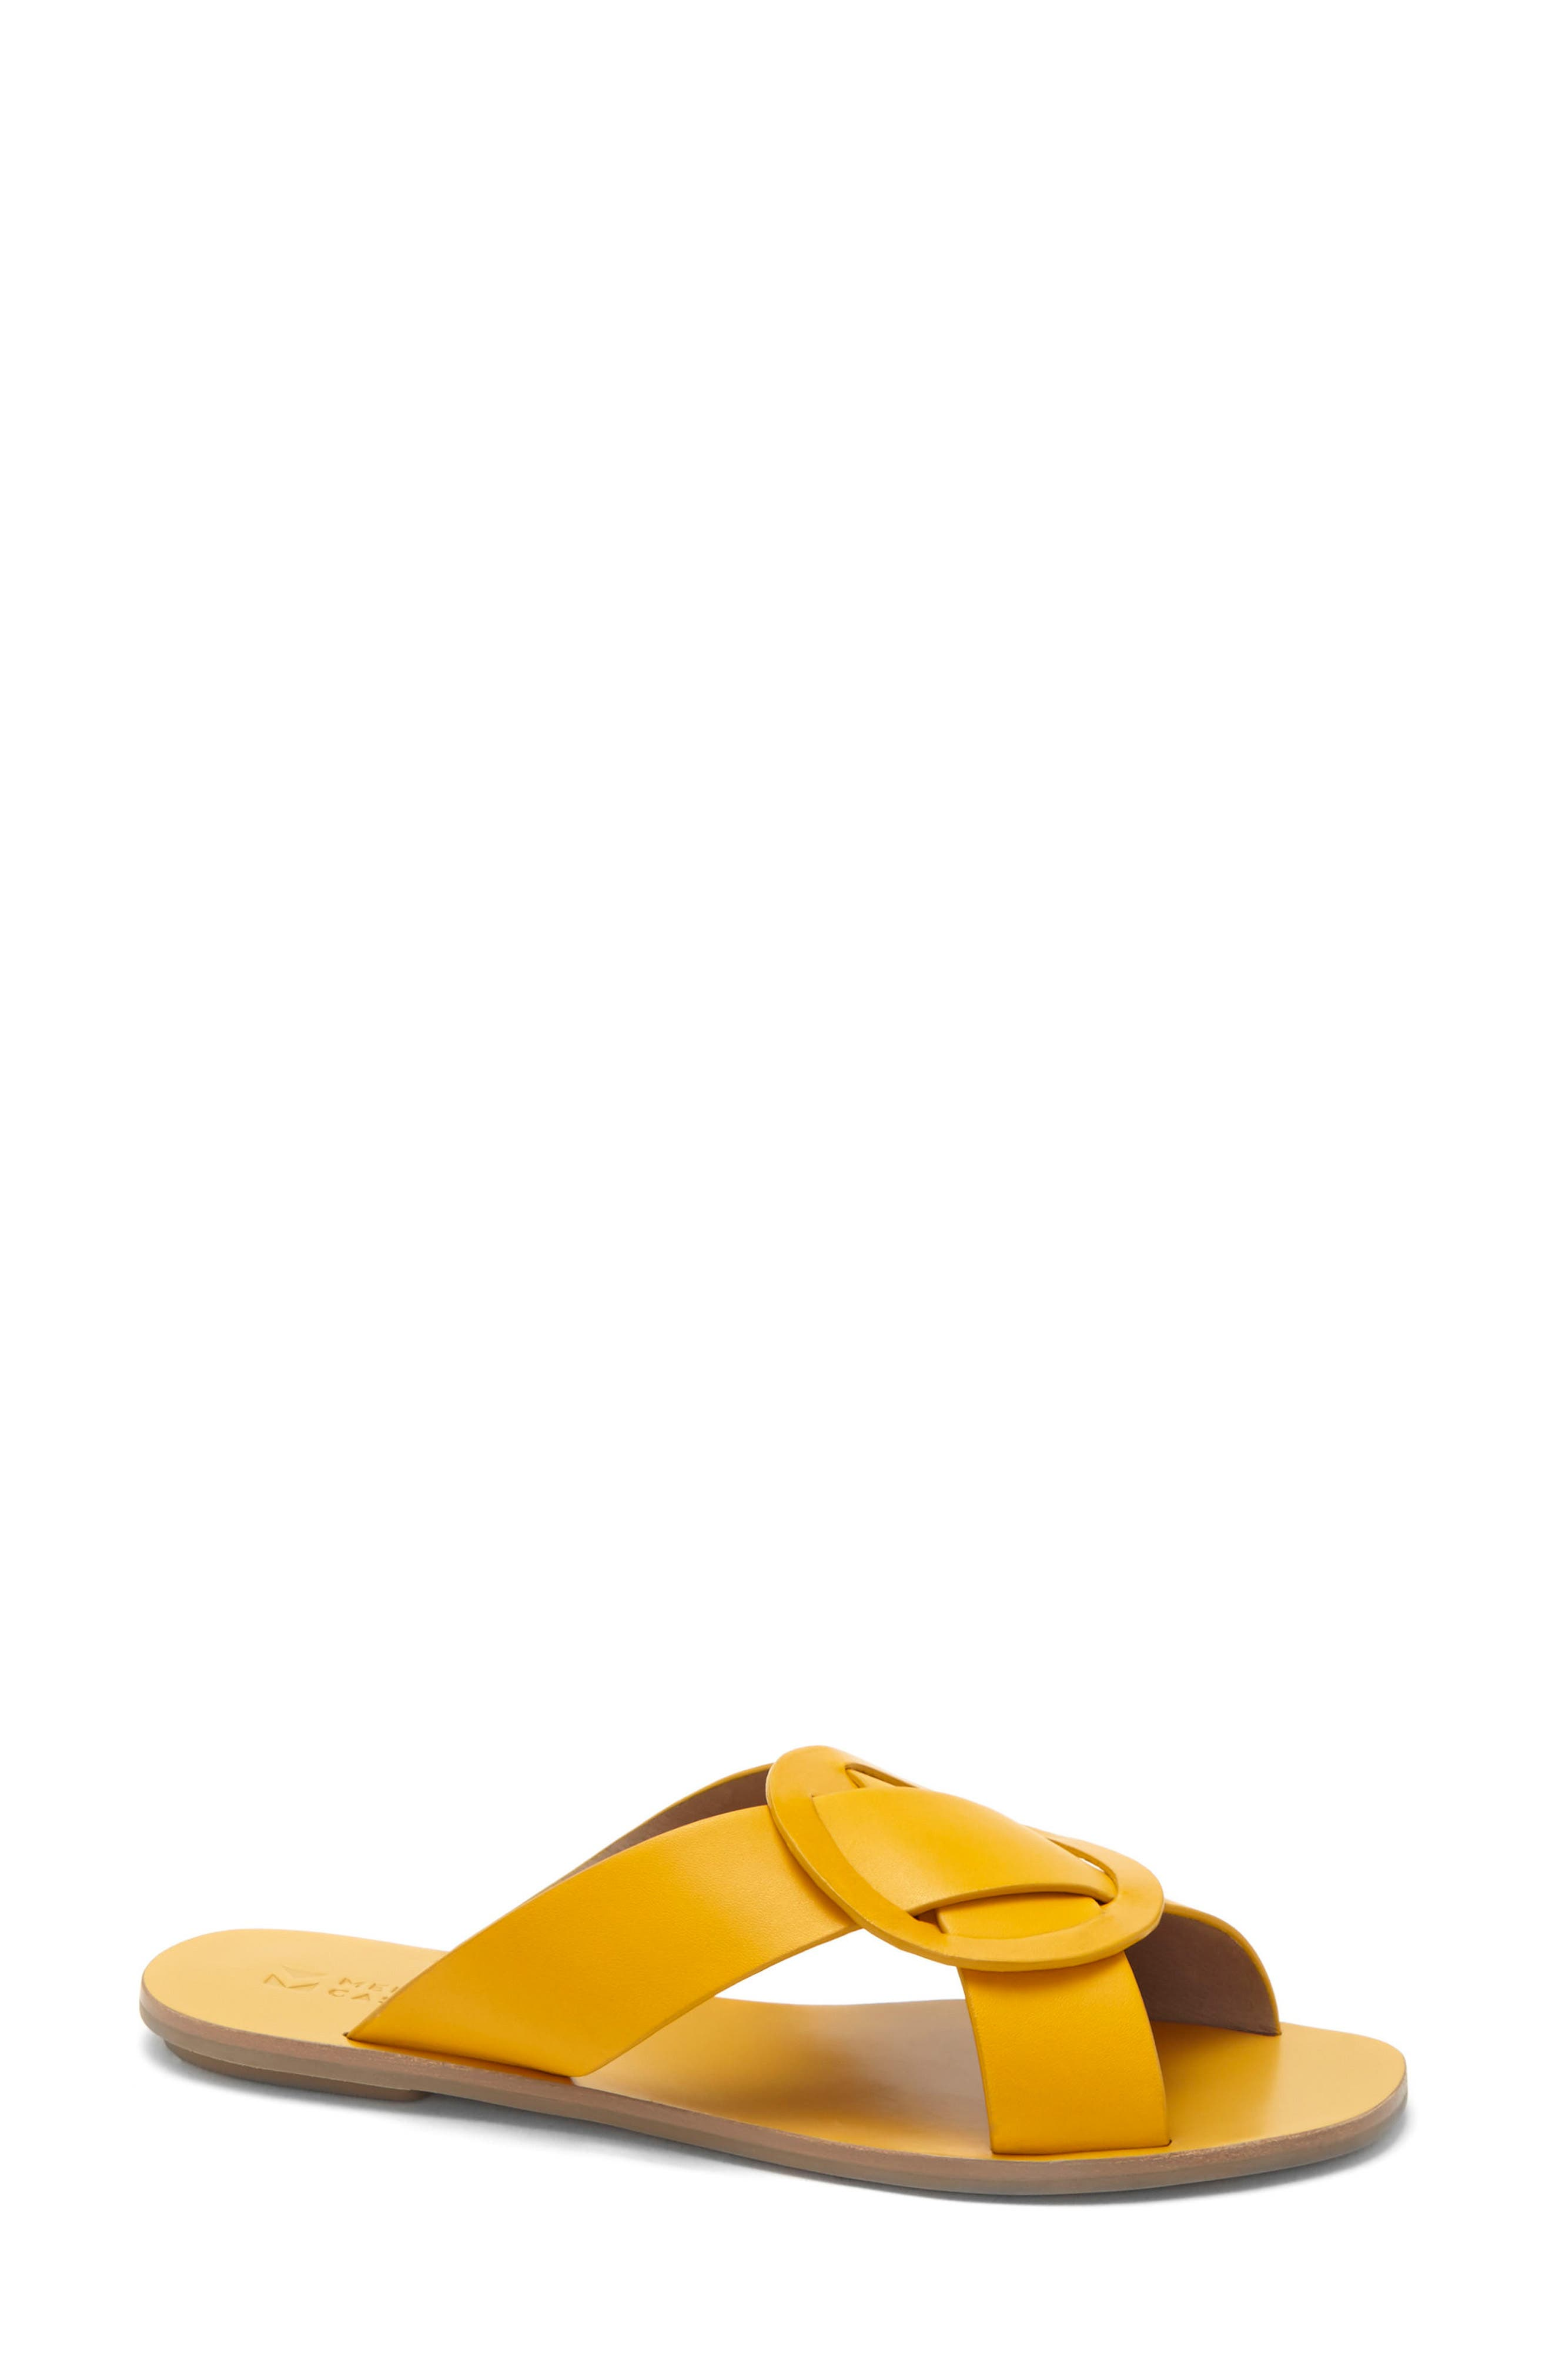 Carlein Slide Sandal,                             Main thumbnail 1, color,                             Mustard Leather